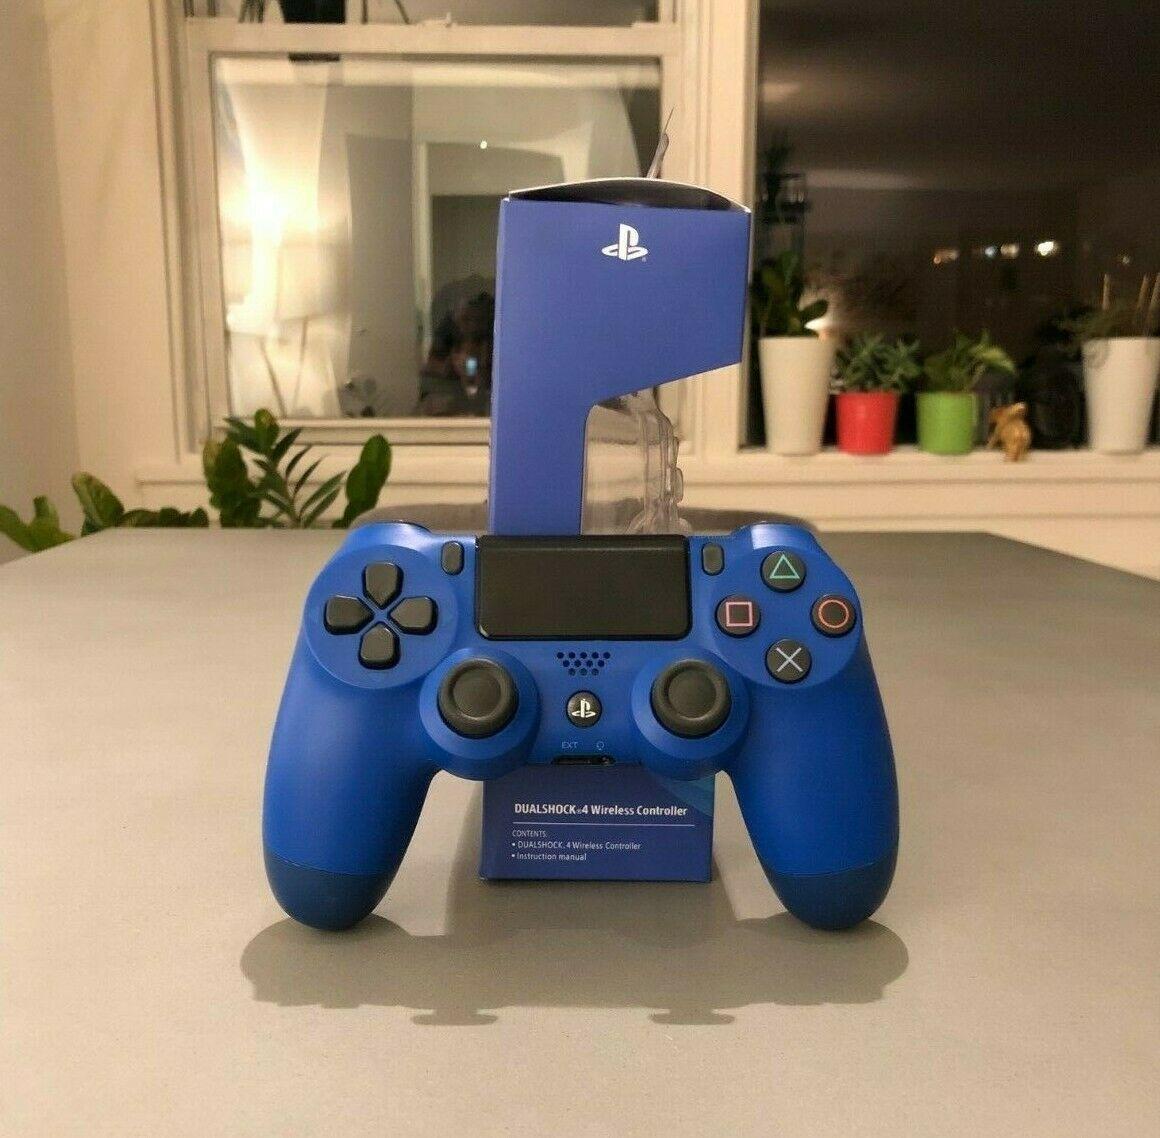 Джойстик Sony PS 4 DualShock 4 Wireless Controller, Геймпад для приставки, джойстик для телефона